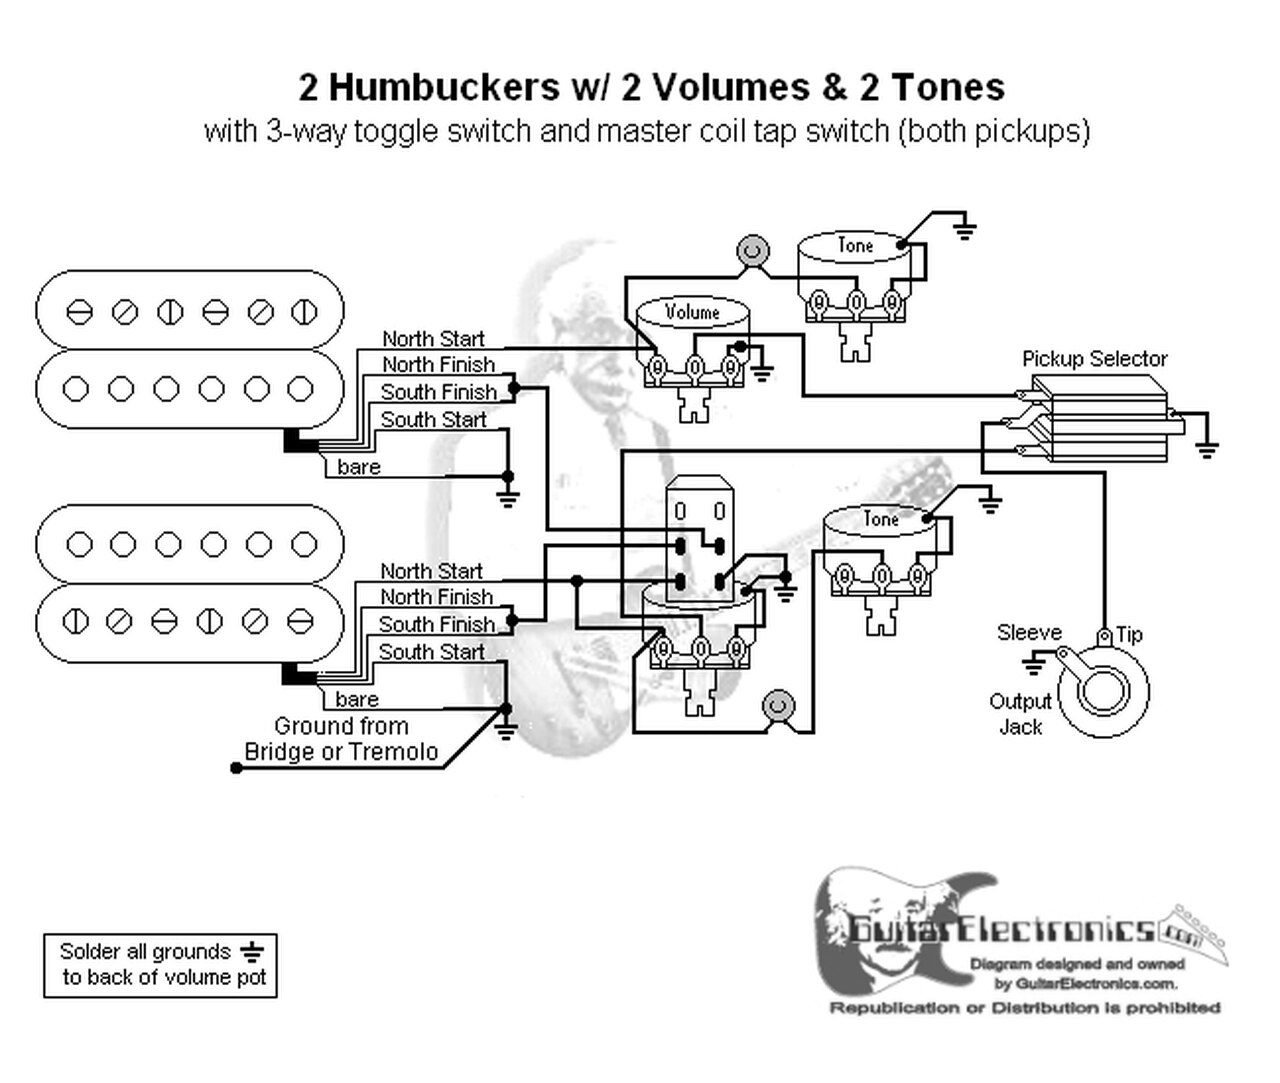 Dimarzio True Velvet Pickup Wiring Diagrams -Tj Fuse Box Interior | Begeboy Wiring  Diagram SourceBegeboy Wiring Diagram Source